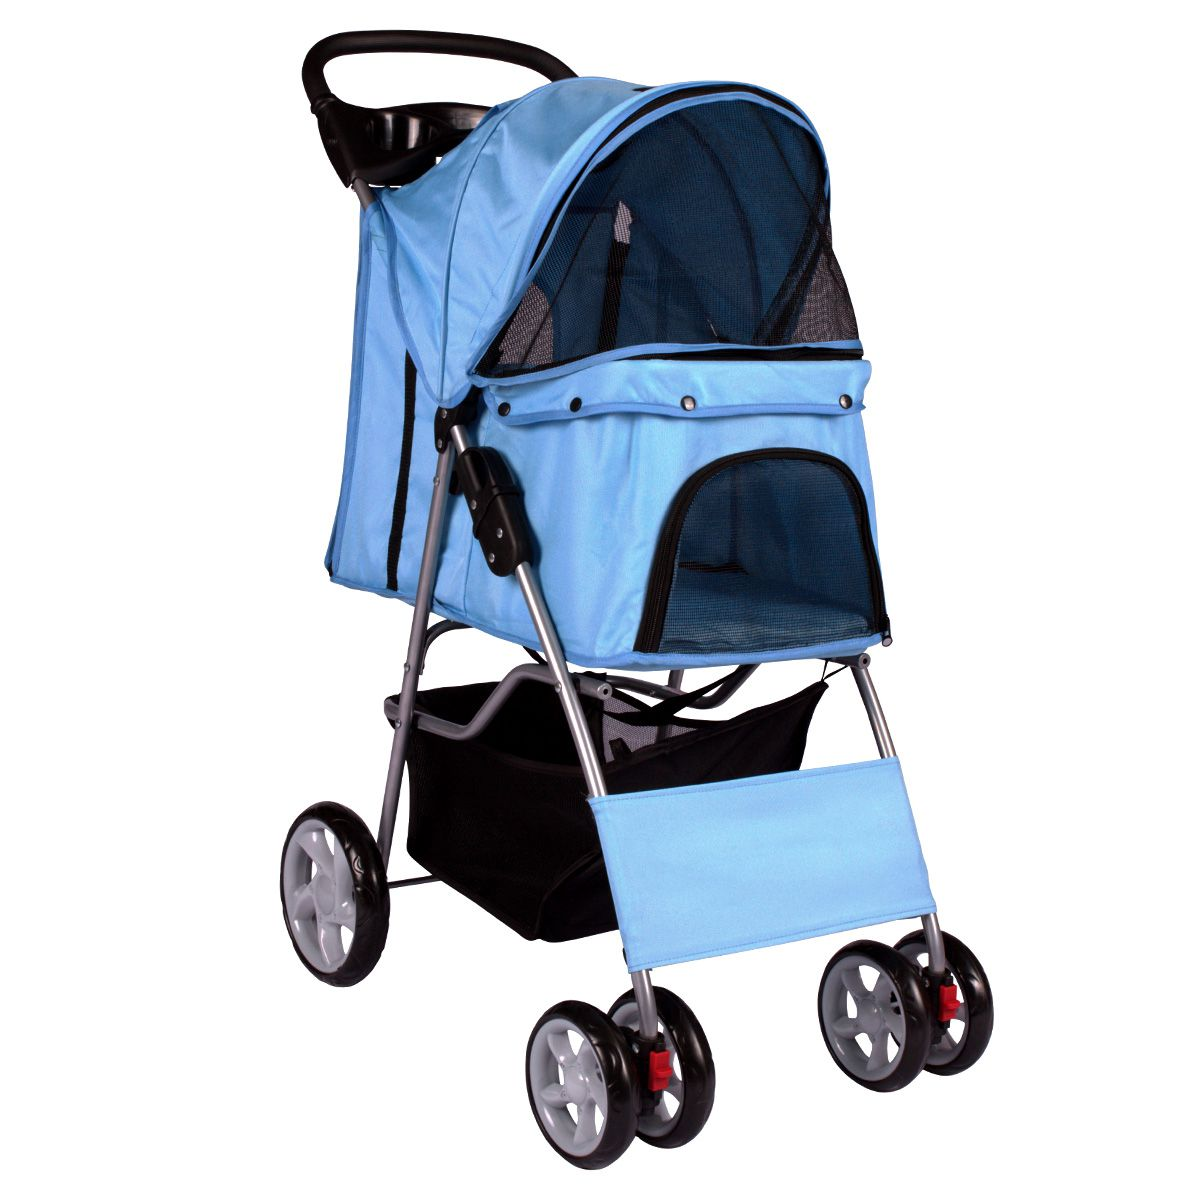 Carrinho Dog Fly modelo Pet Deluxe - Azul